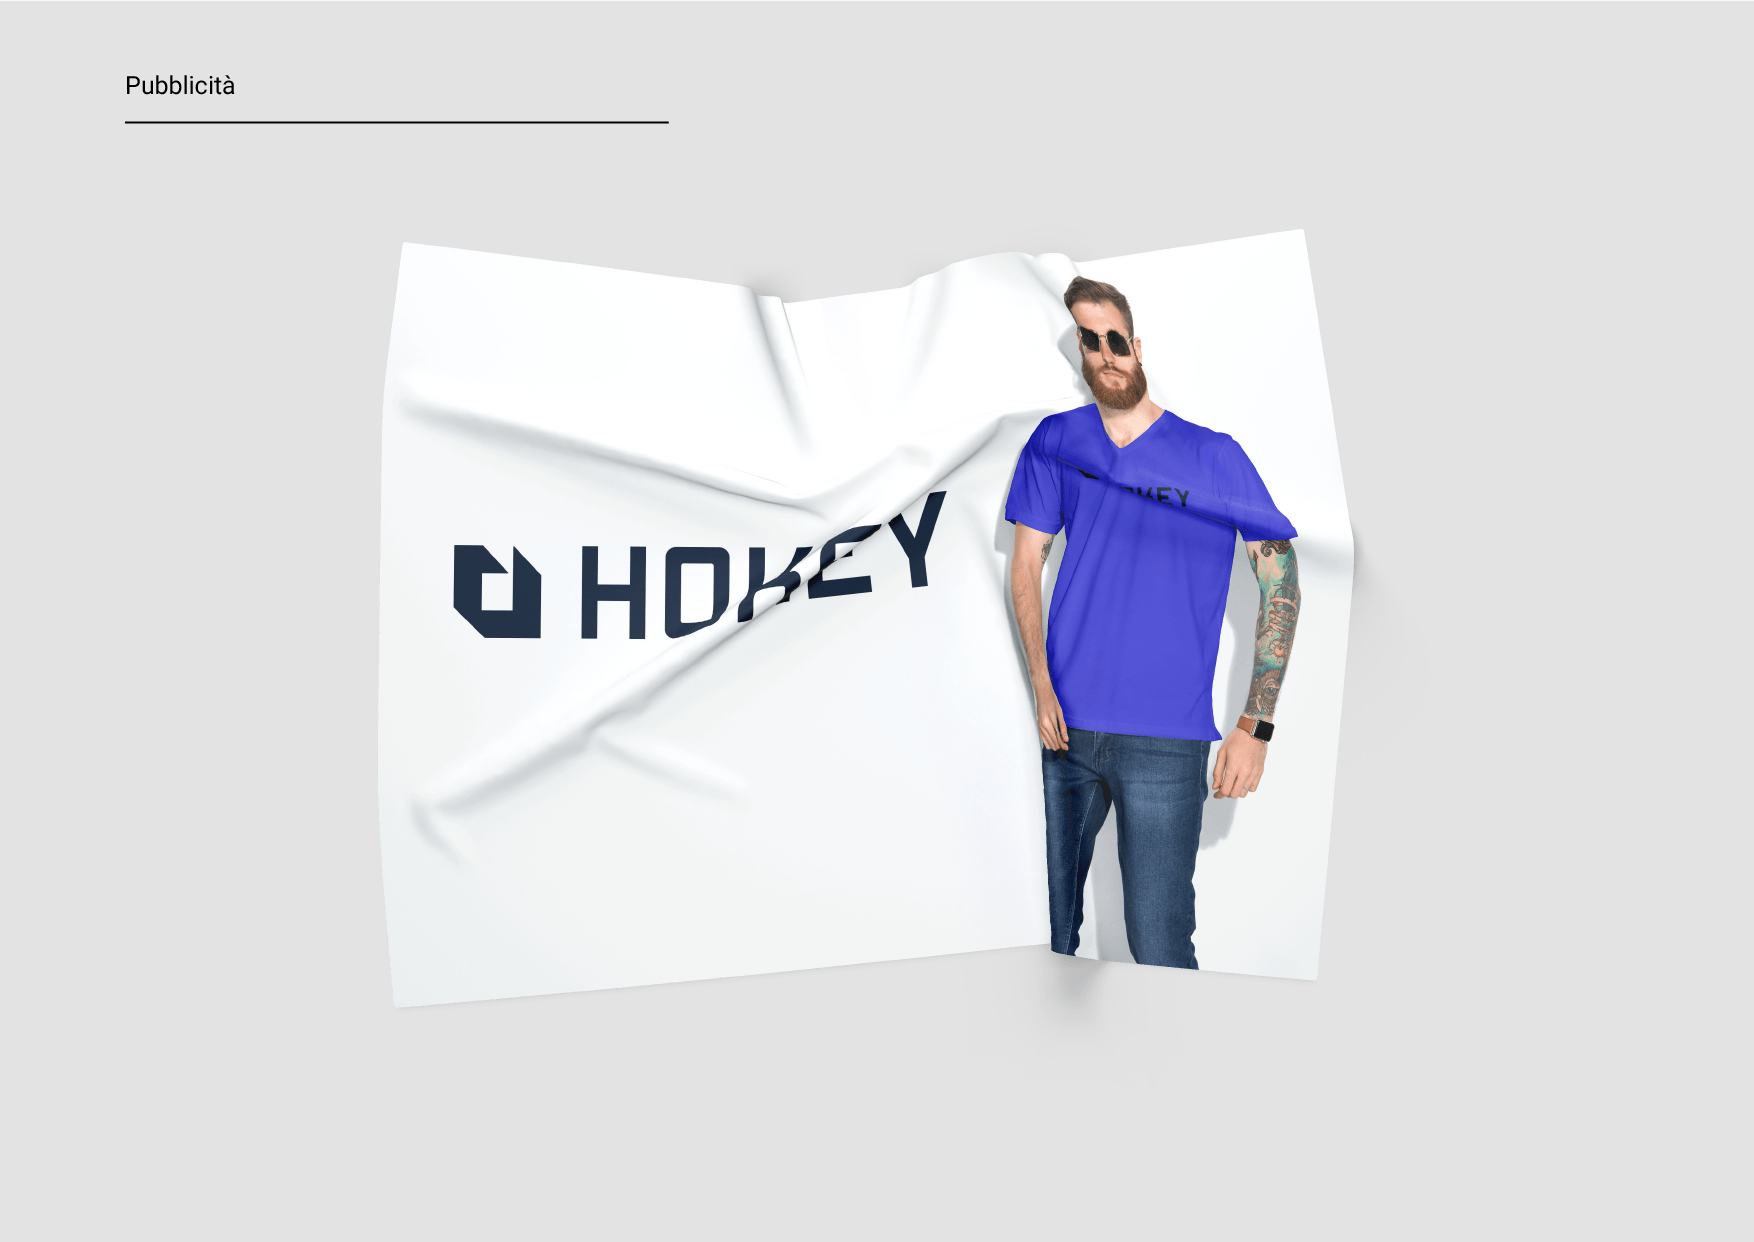 HOKEY